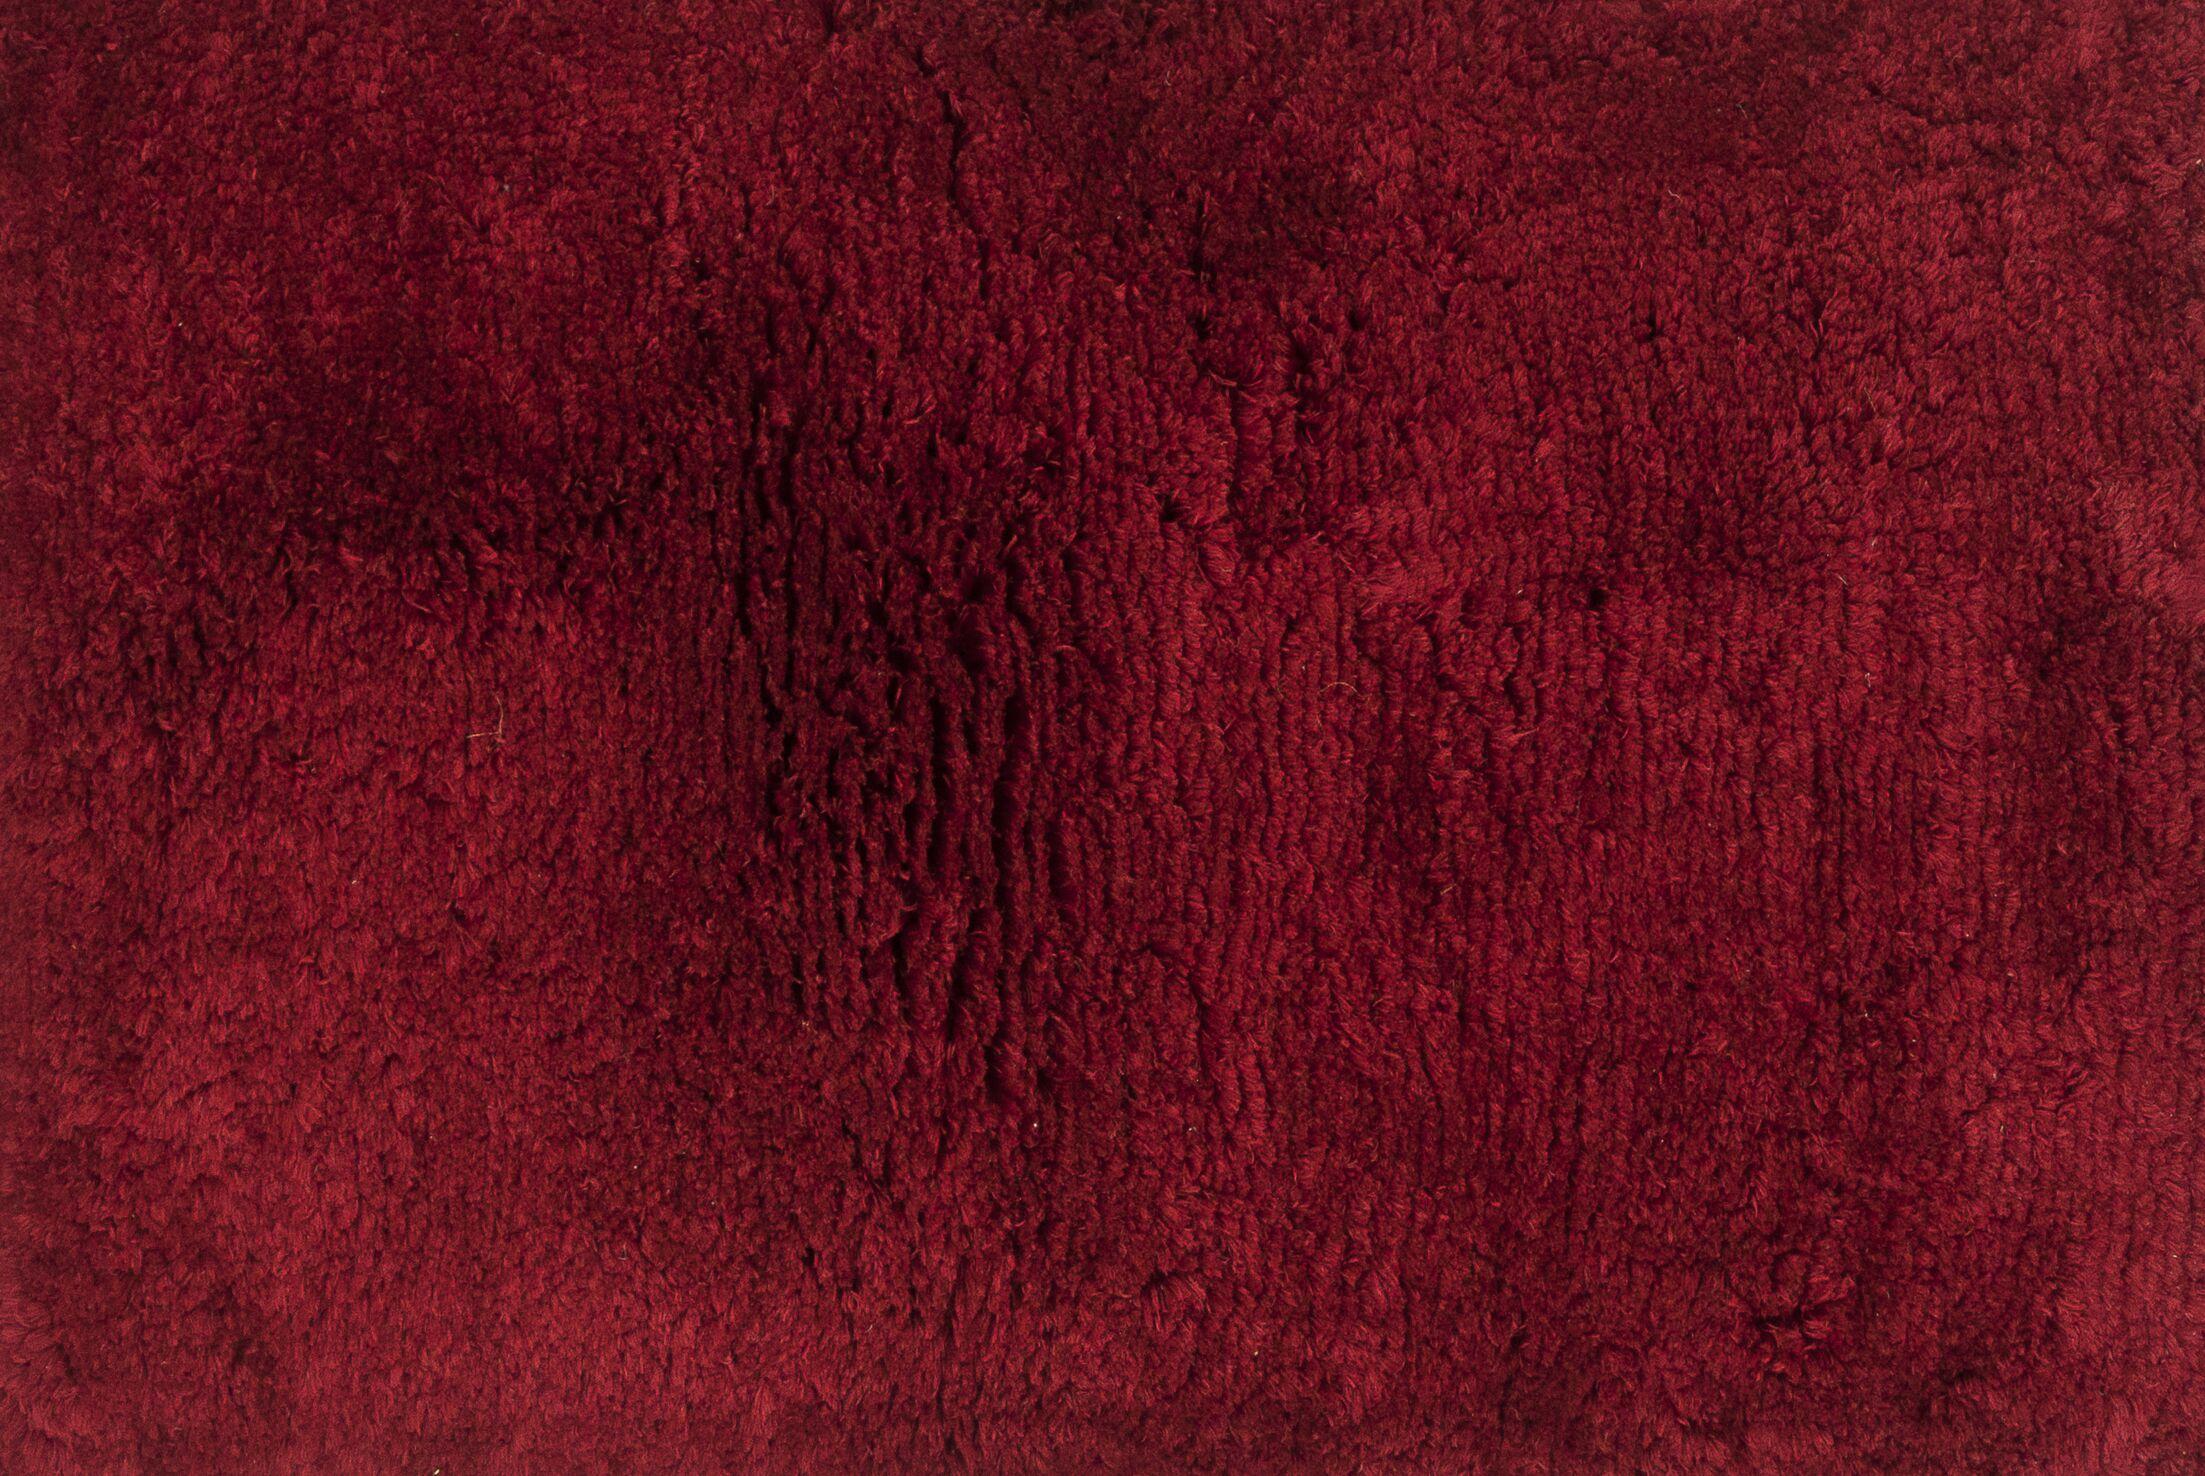 DeGennaro Hand-Tufted Crimson Area Rug Rug Size: Rectangle 9'3